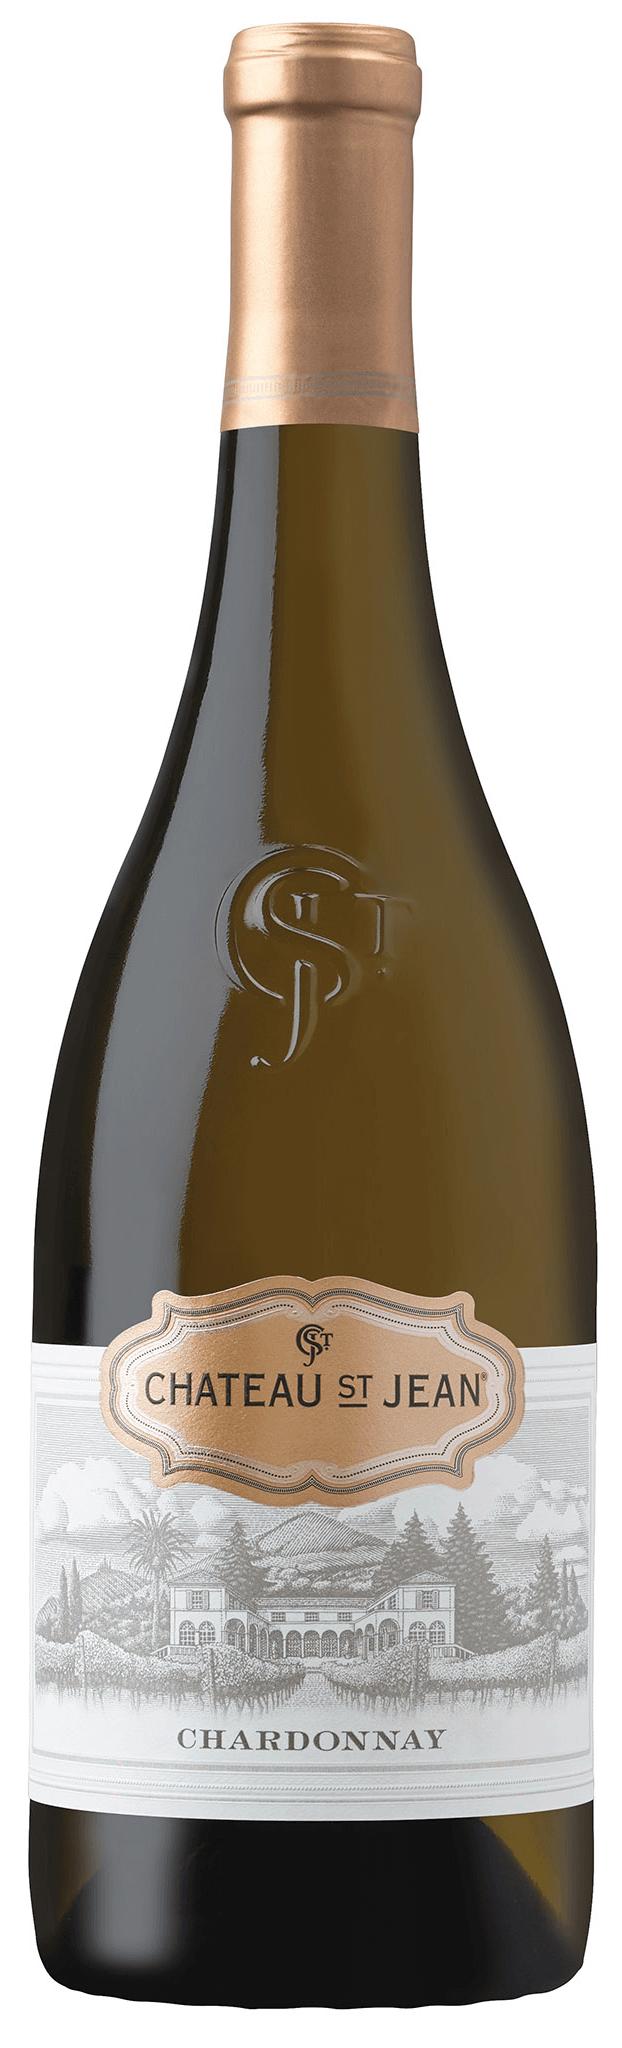 2017 Chateau St Jean Chardonnay 750ml